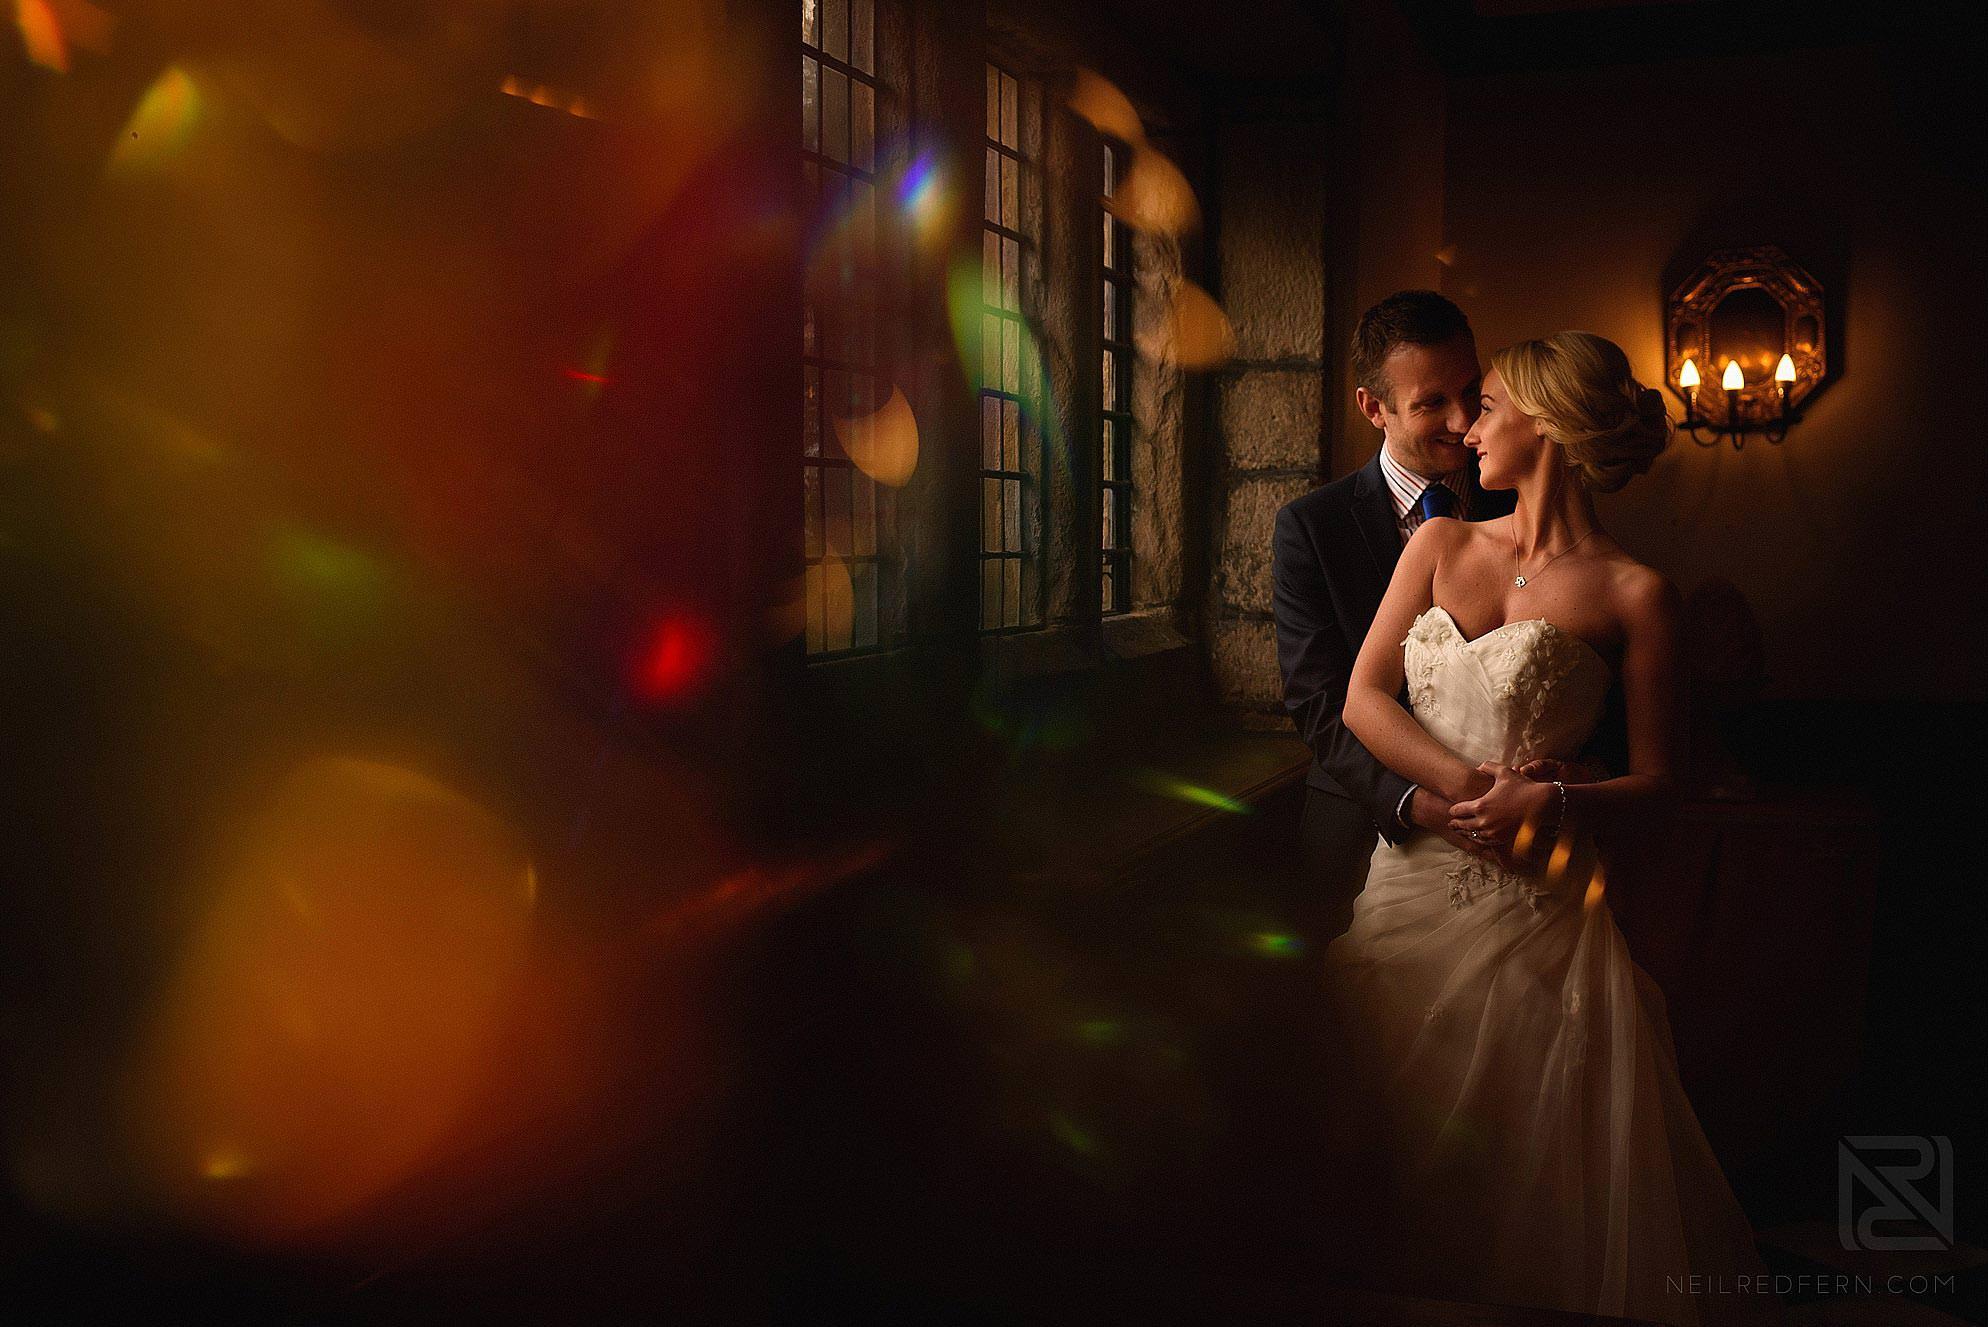 best-wedding-photography-2016-029